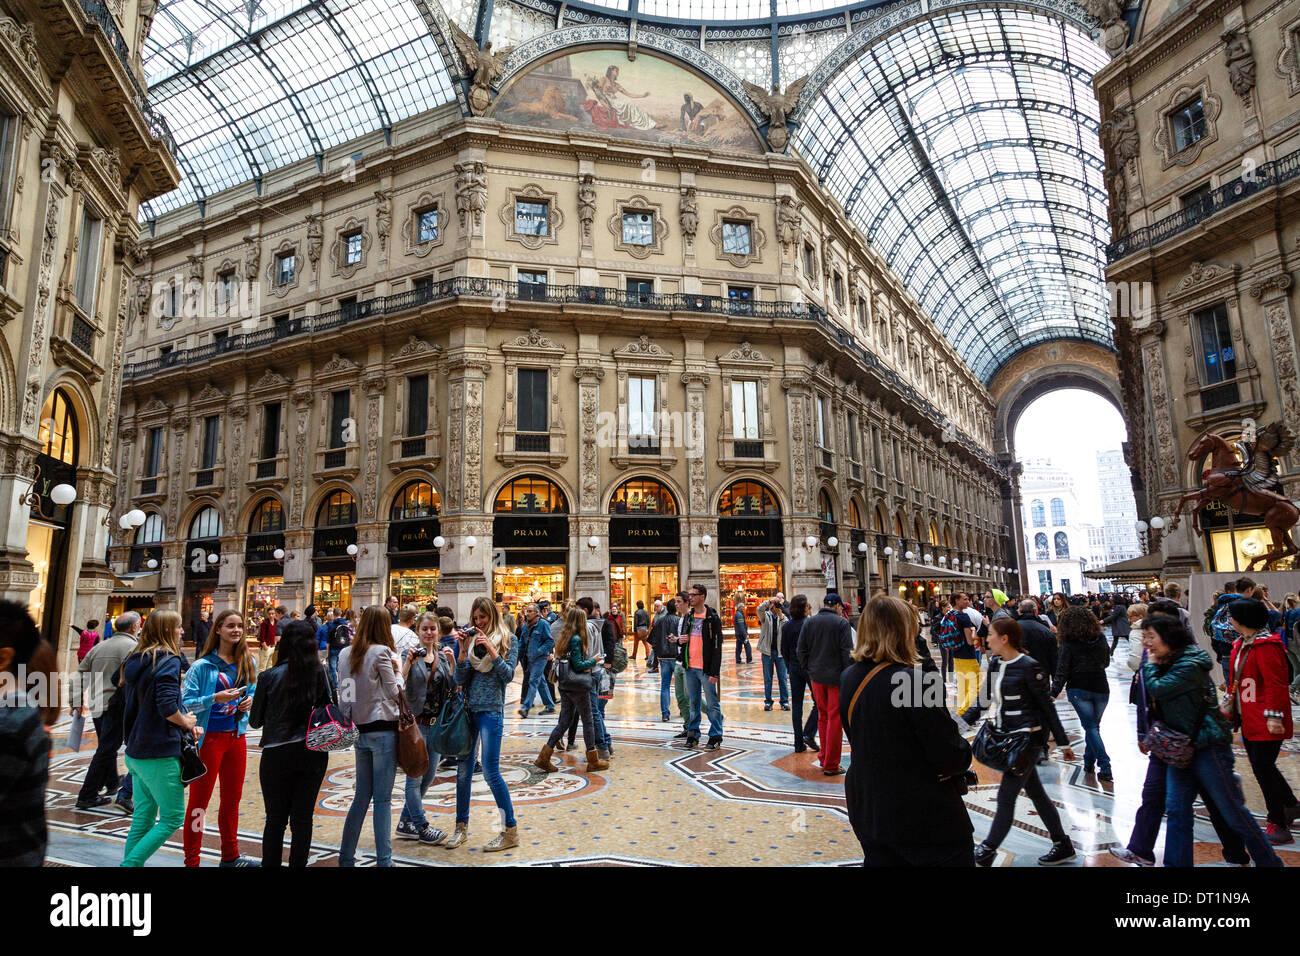 Galleria Vittorio Emanuele II, Milan, Lombardy, Italy, Europe - Stock Image